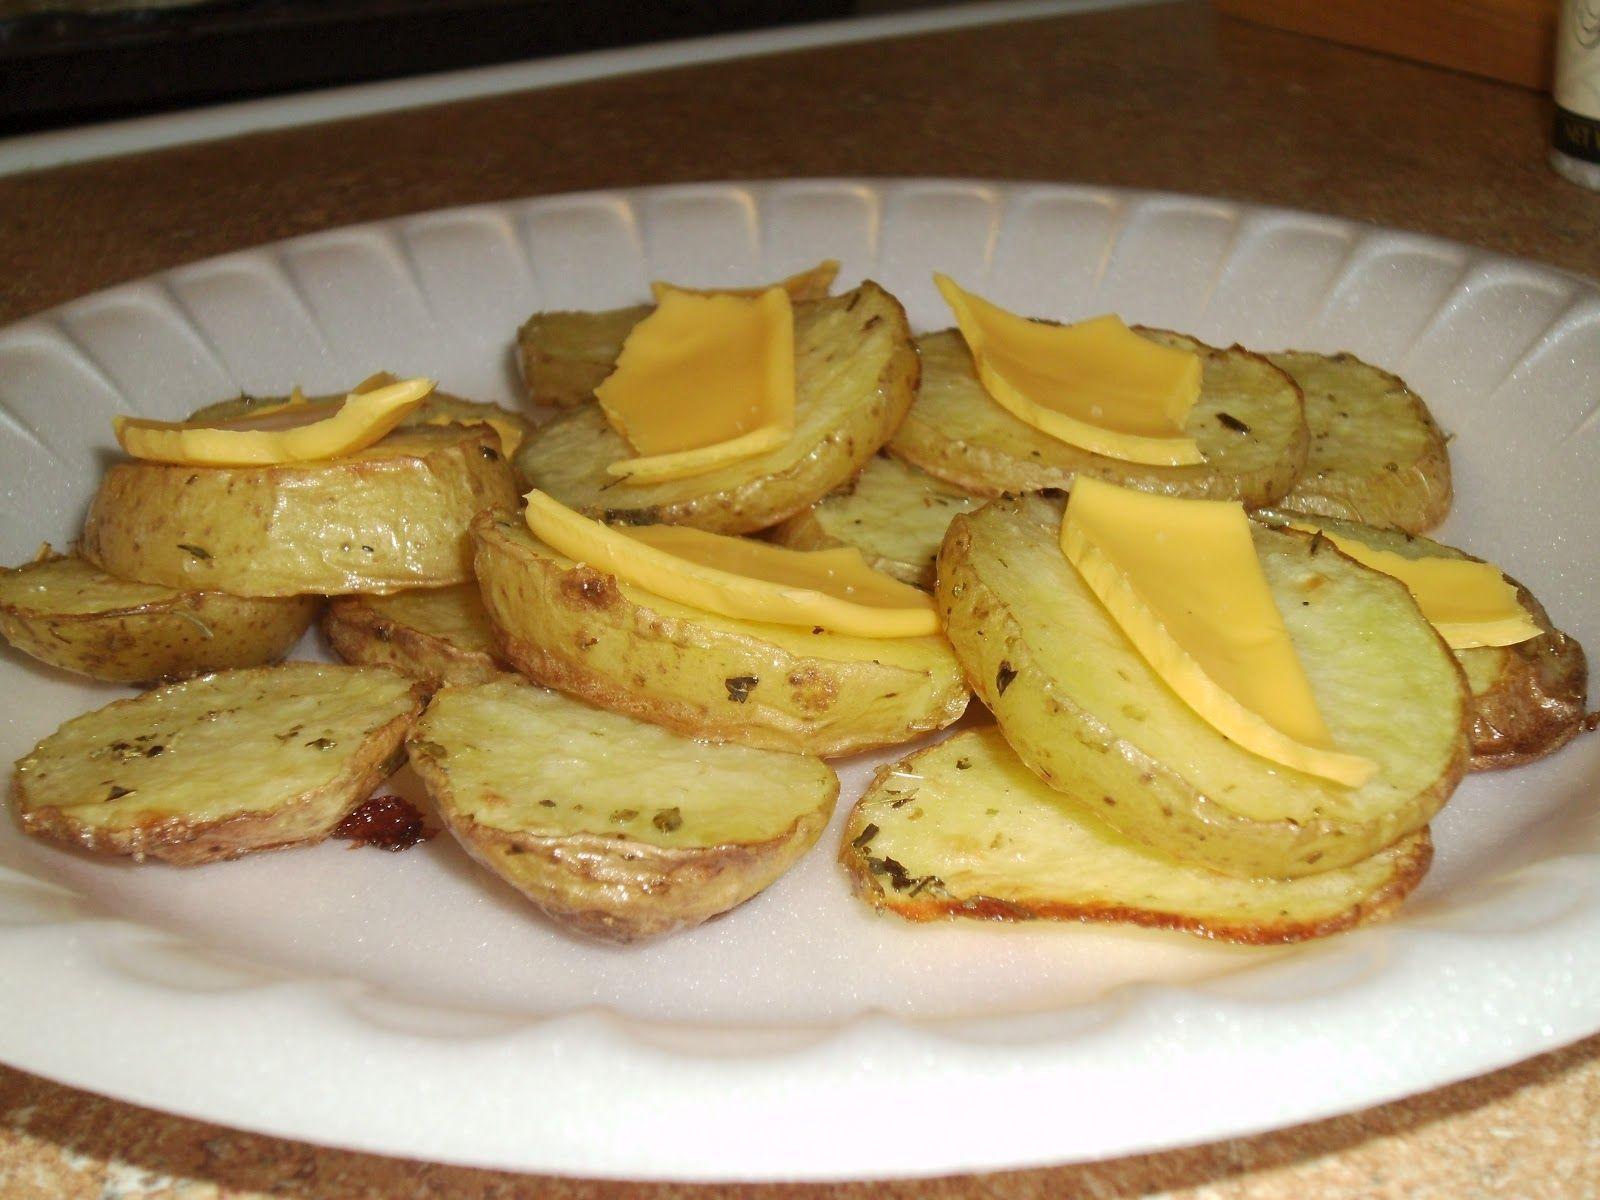 Ovo lacto vegetarian recipes baked potatoe slices fast easy and ovo lacto vegetarian recipes baked potatoe slices fast easy and amazingly good forumfinder Choice Image